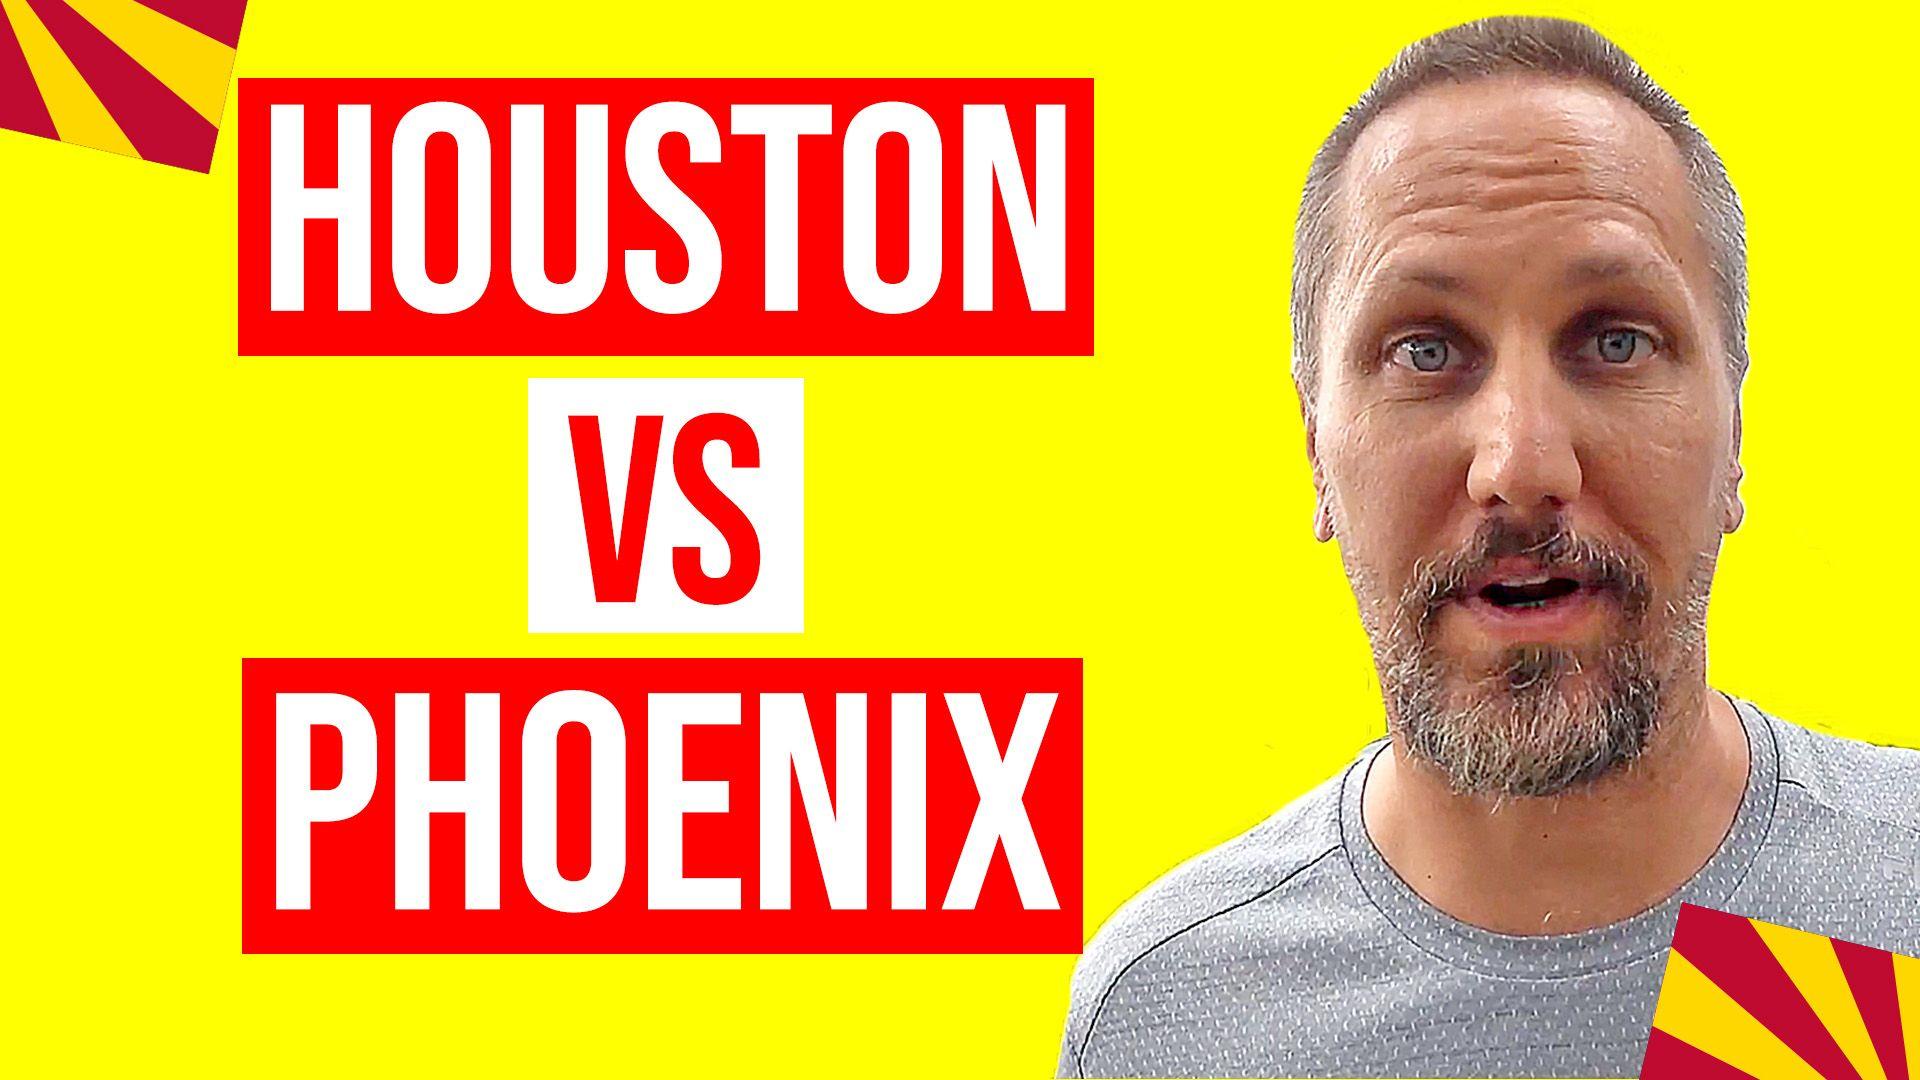 Phoenix Arizona Vs Houston Texas Moving To Houston Tx Or Phoenix Az Which Is Better Arizona Moving Advice Living In Arizona